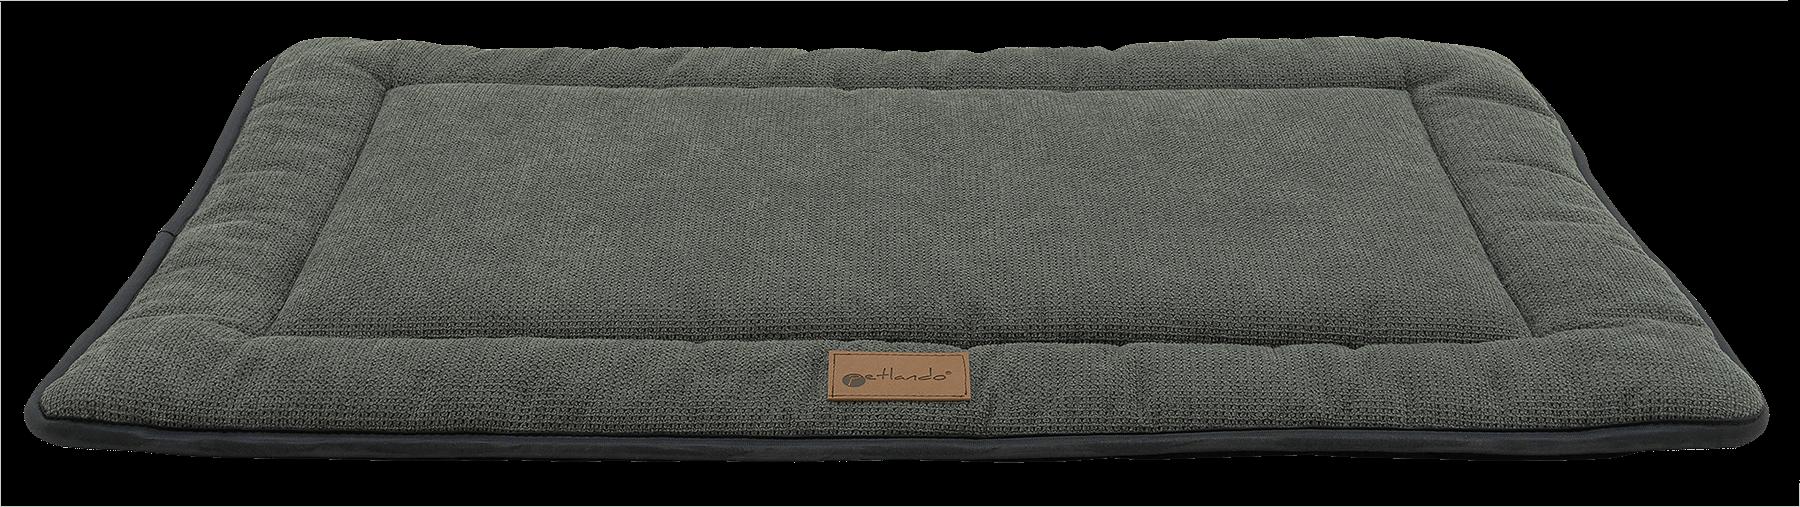 Relaxmat 60x40x5.5cm  -S- Grey